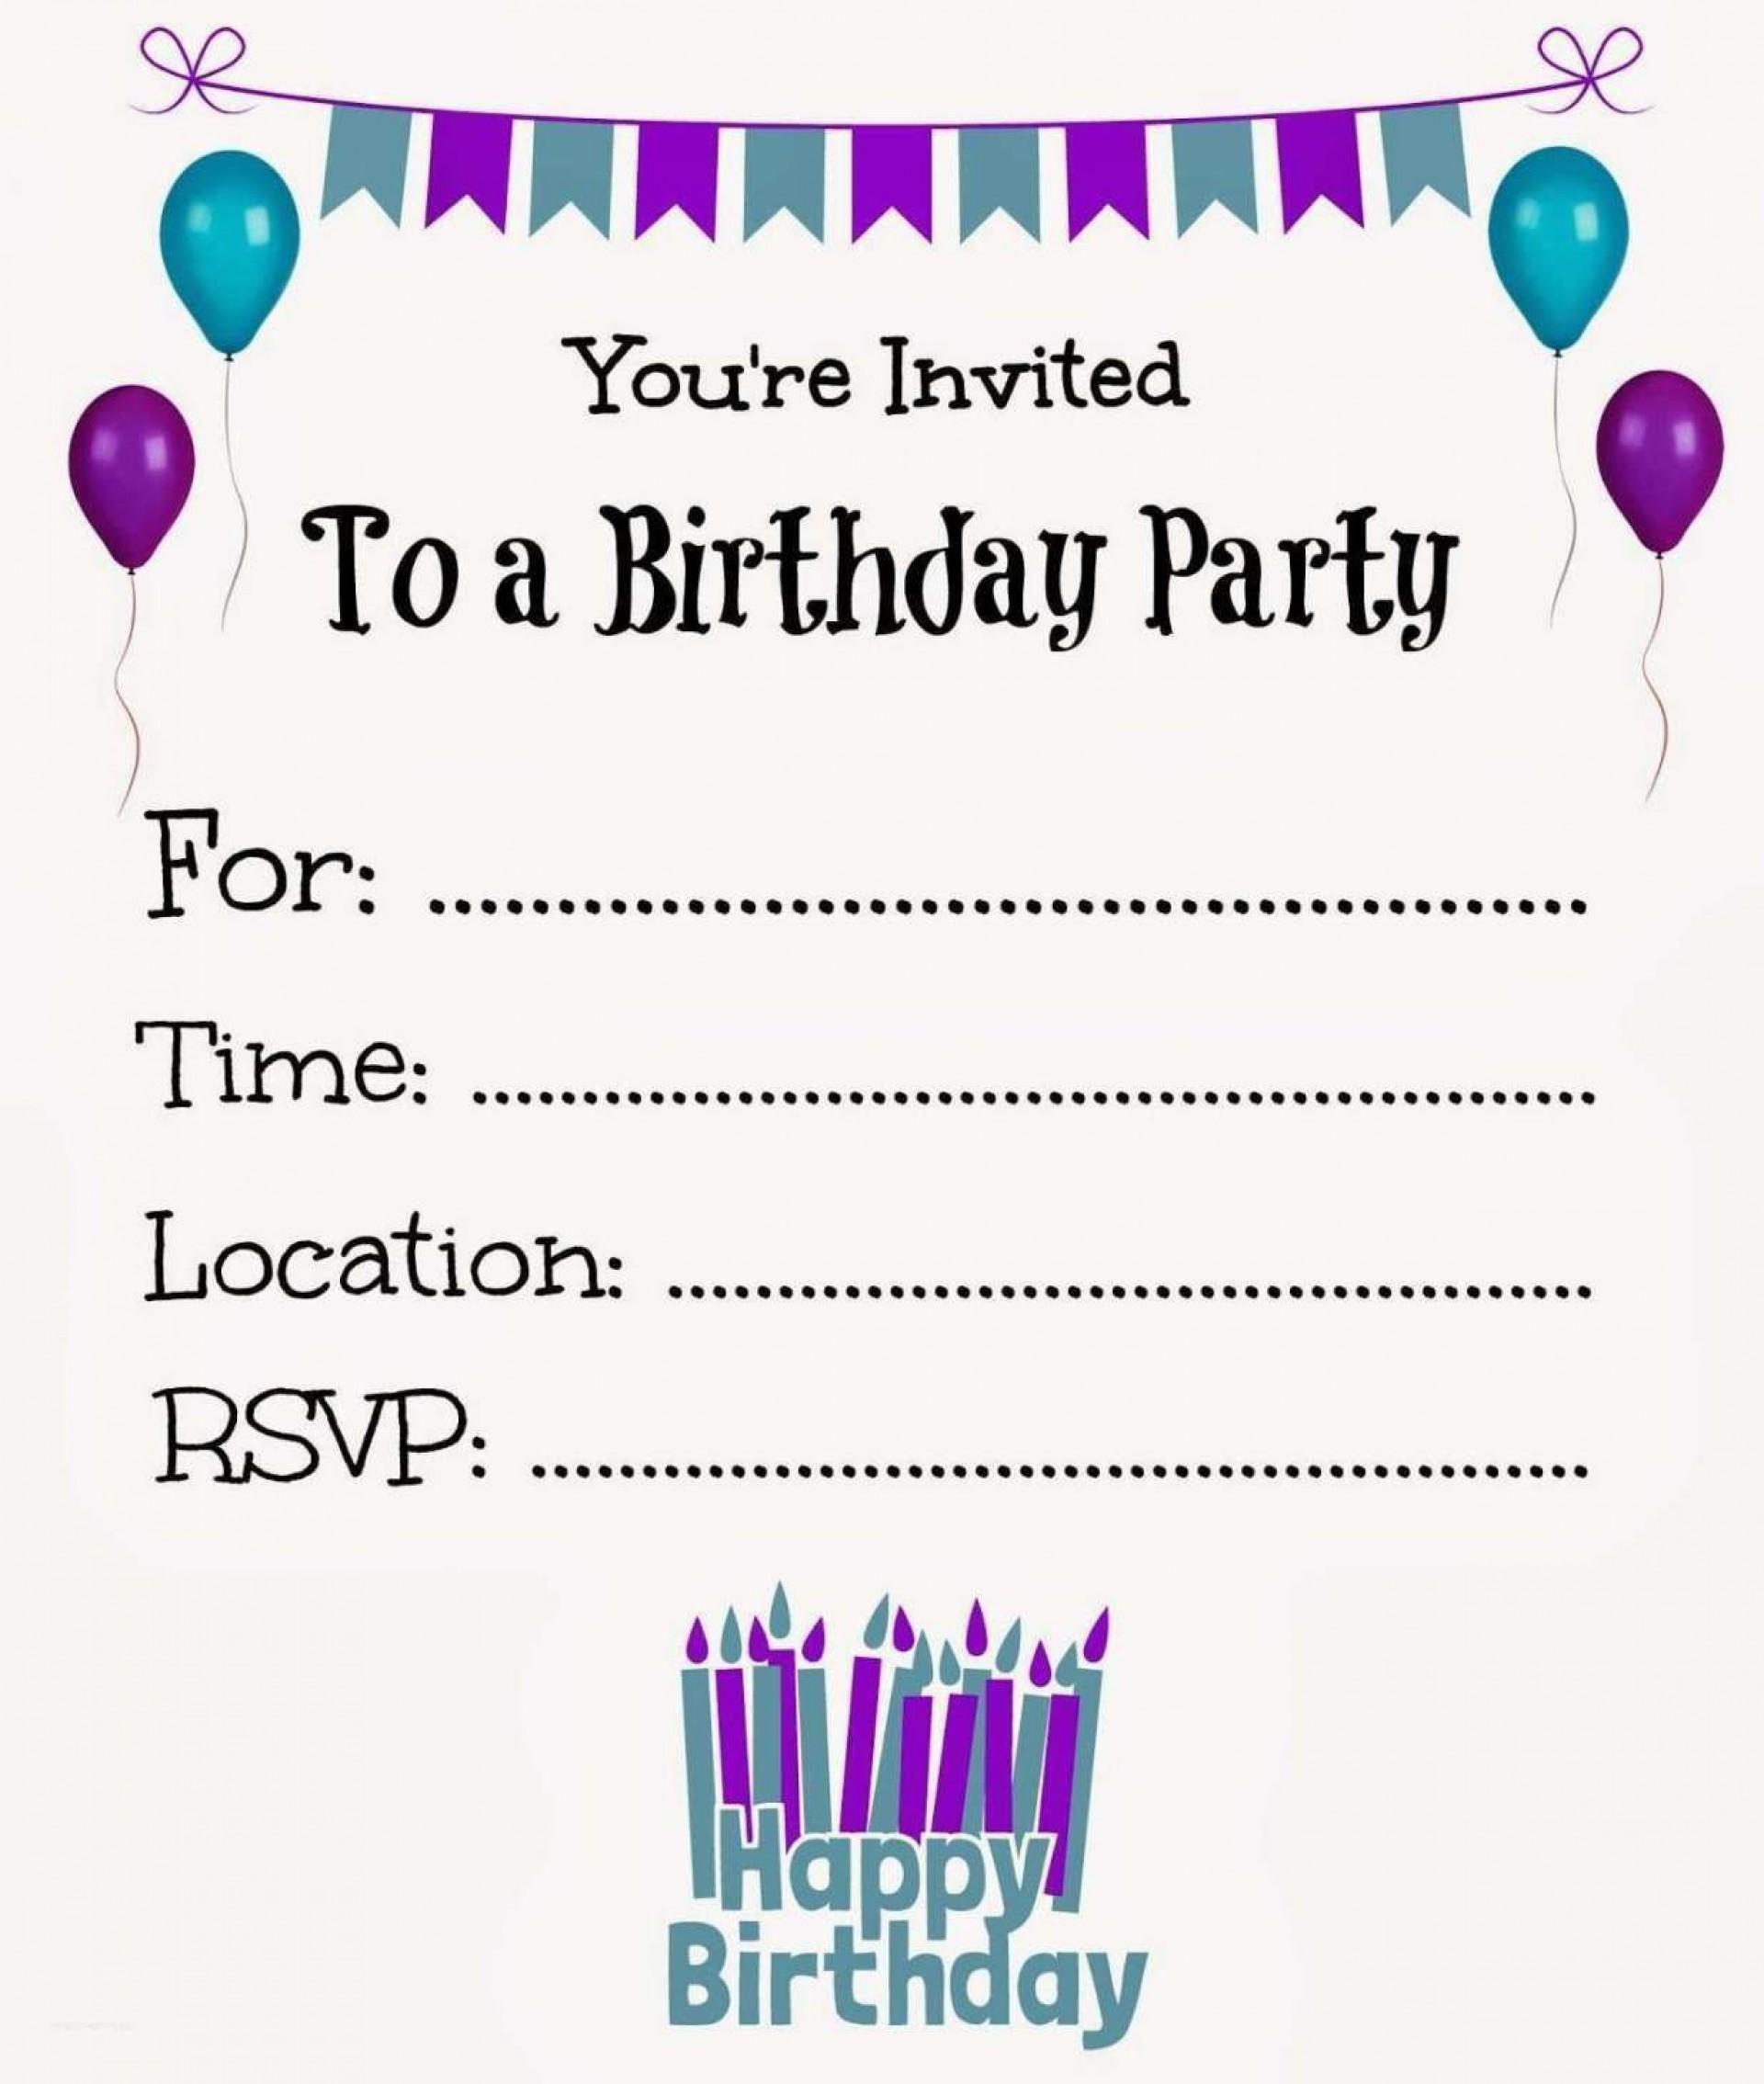 002 Impressive Free Online Invitation Template Printable Photo  Baby Shower Wedding1920